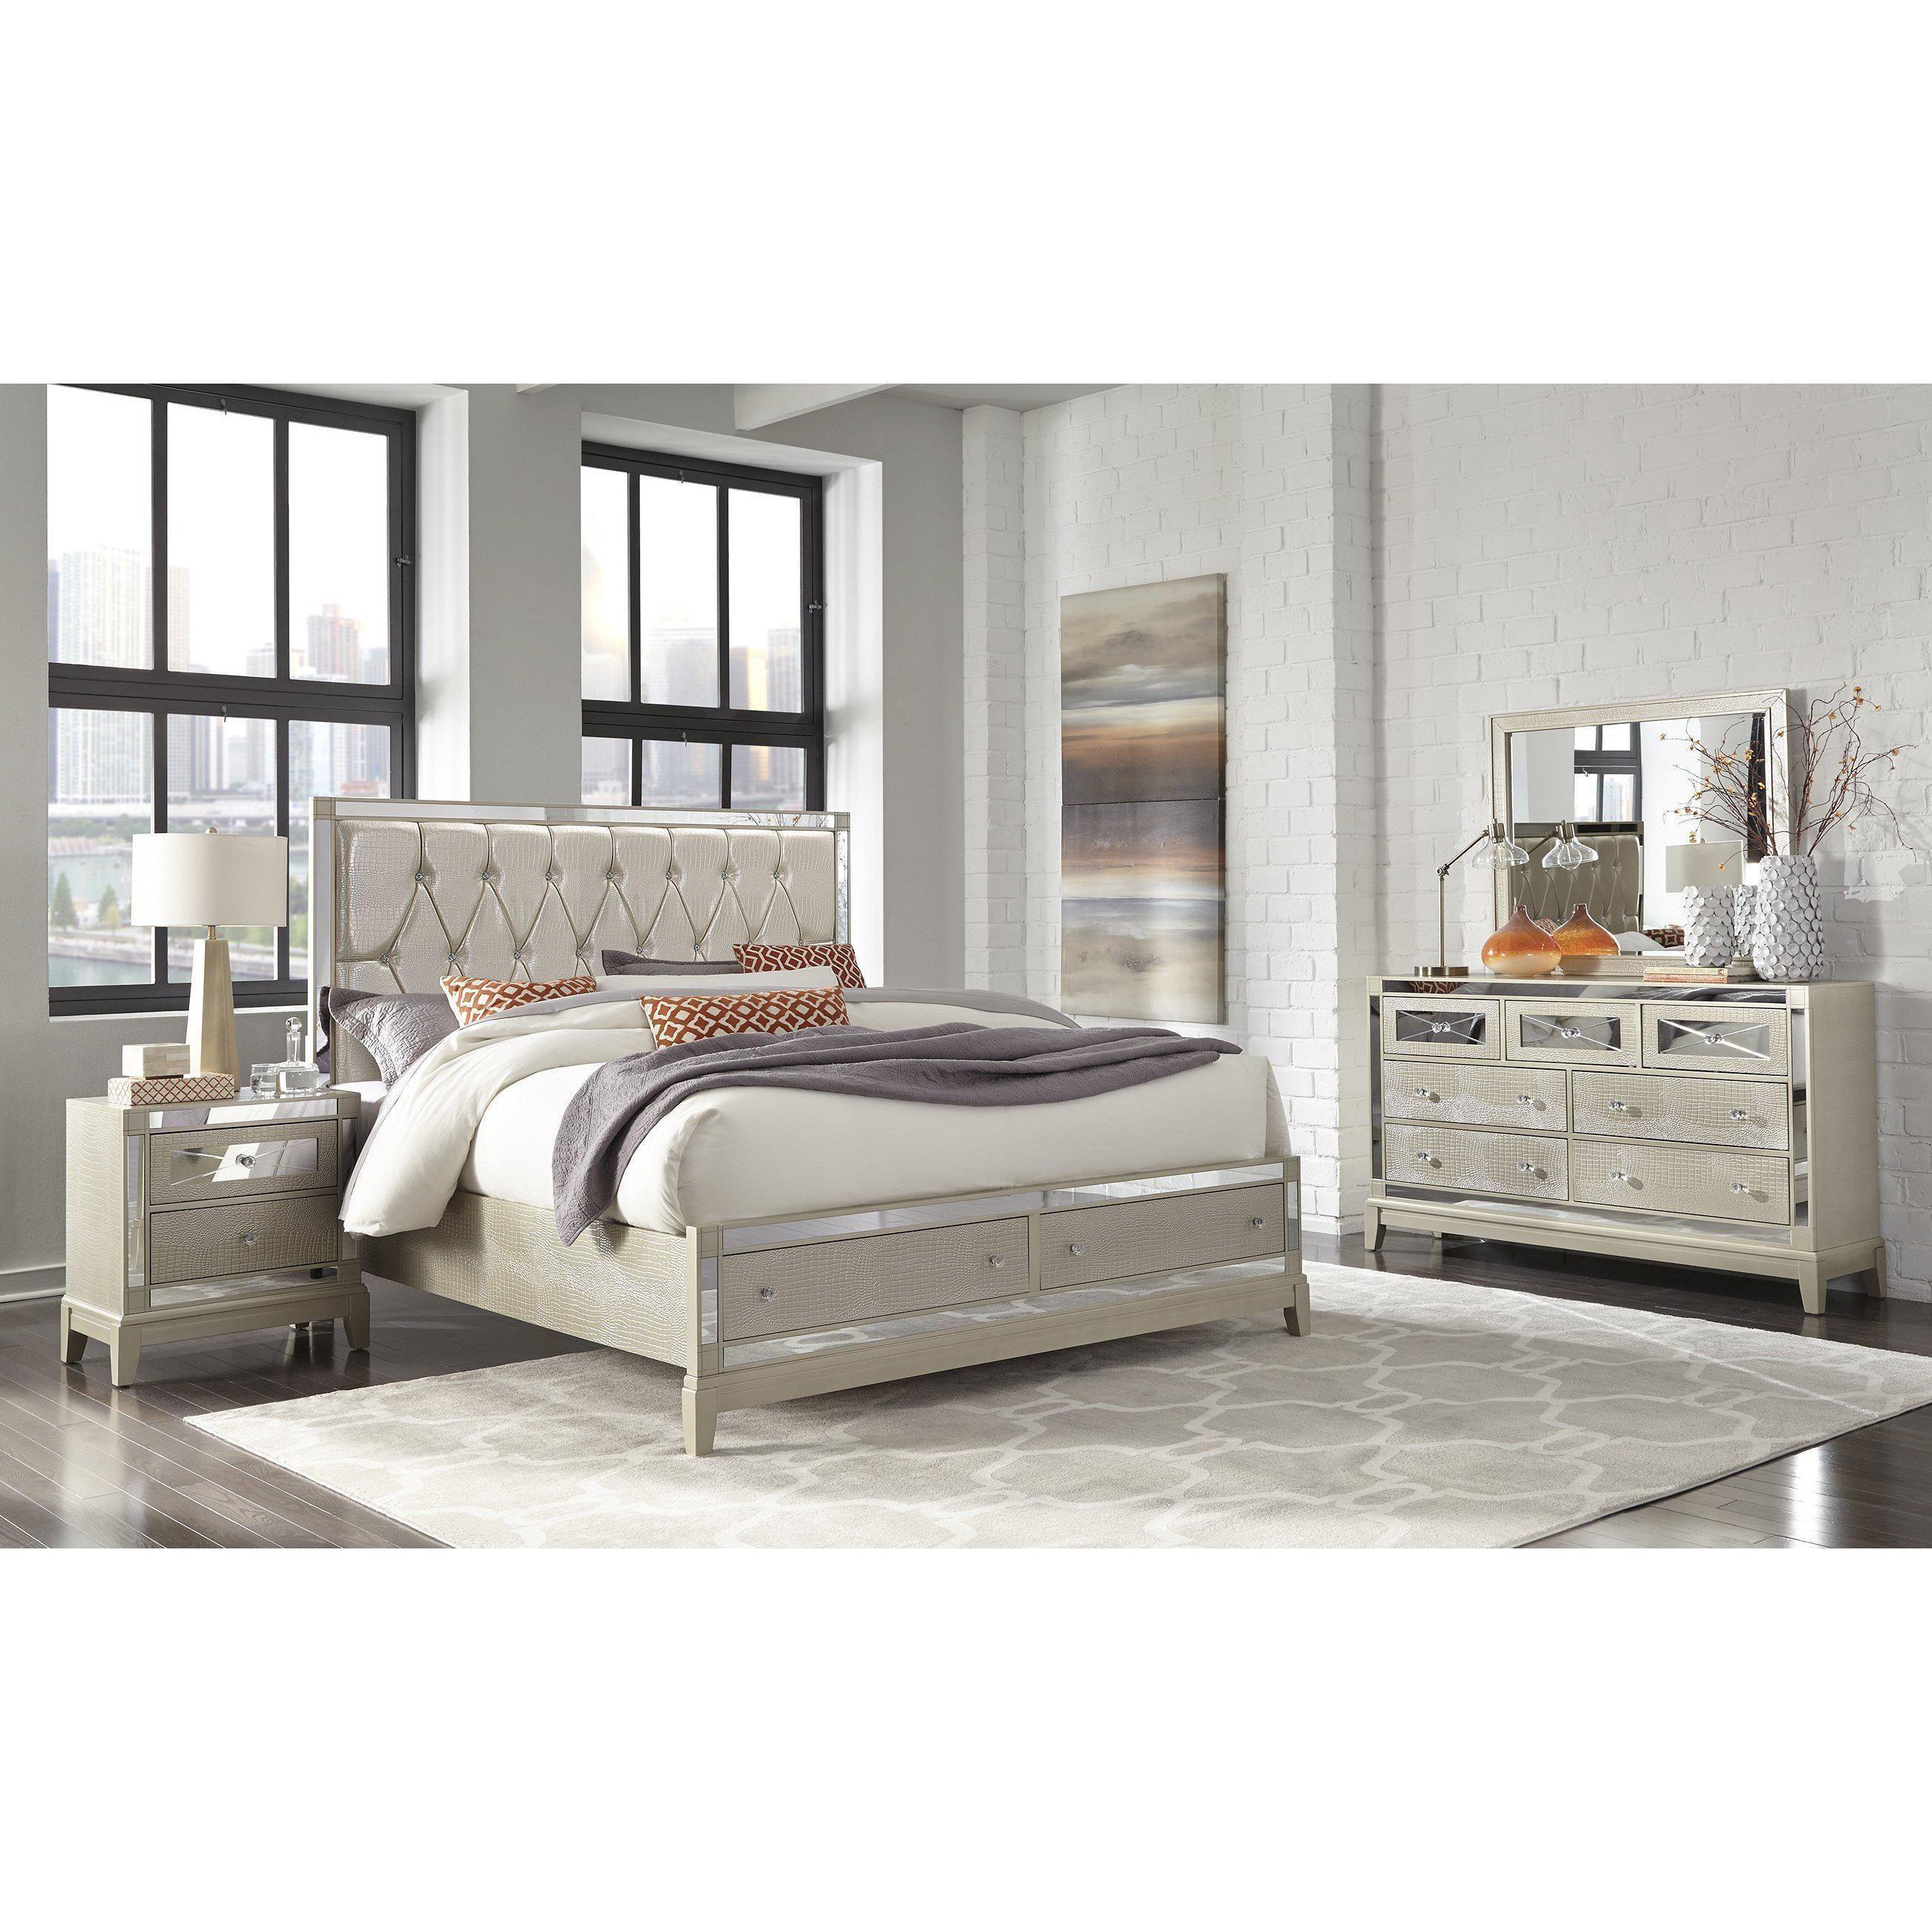 Mirror Storage Bed King bedroom sets, Rustic bedroom